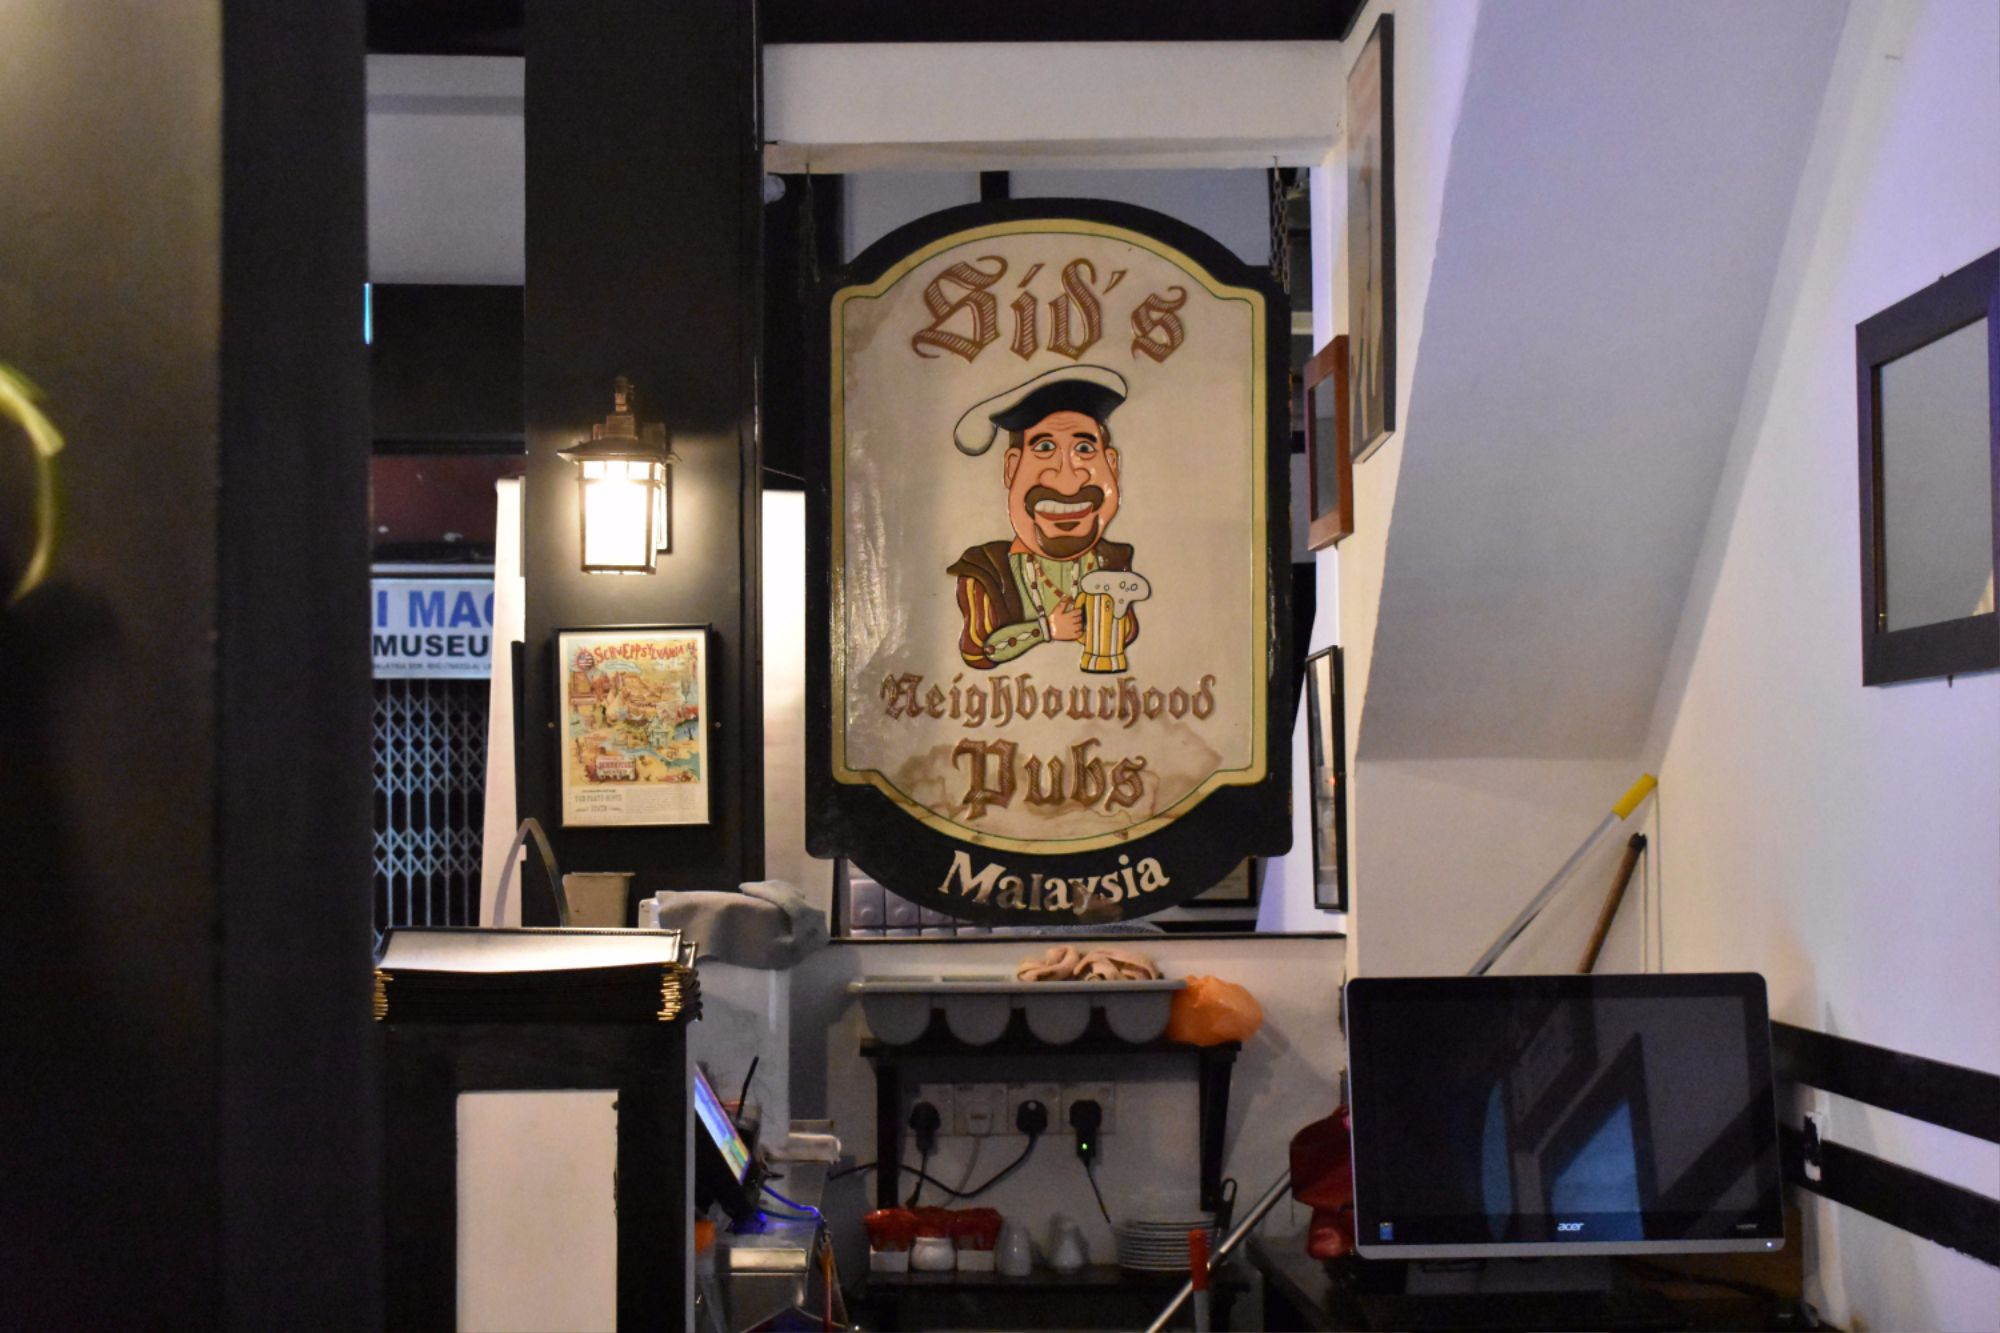 sid's pub jonker street malacca